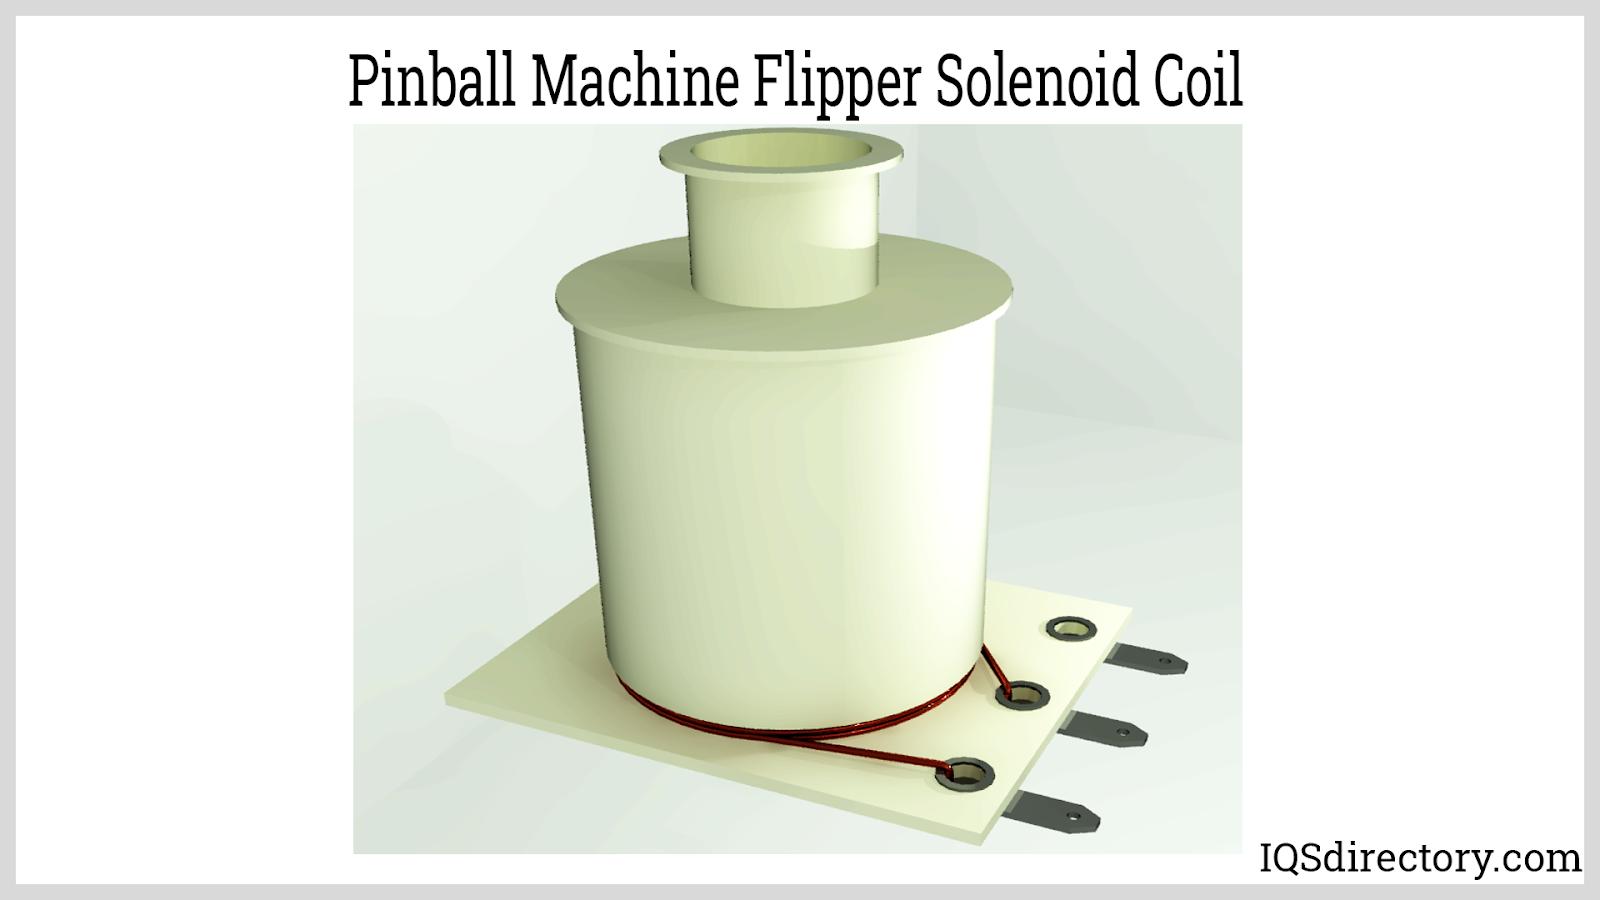 Pinball Machine Flipper Solenoid Coil